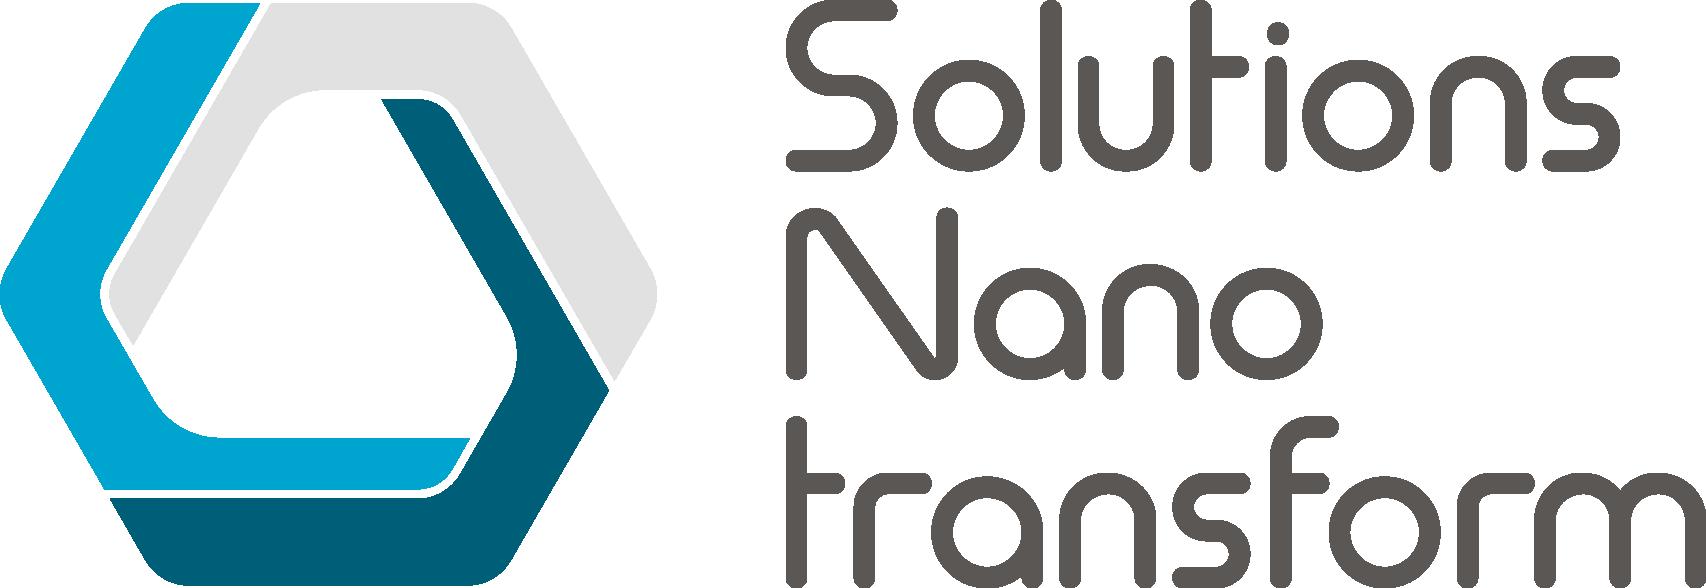 Nanotransform's logo colored on light backgrounds.png